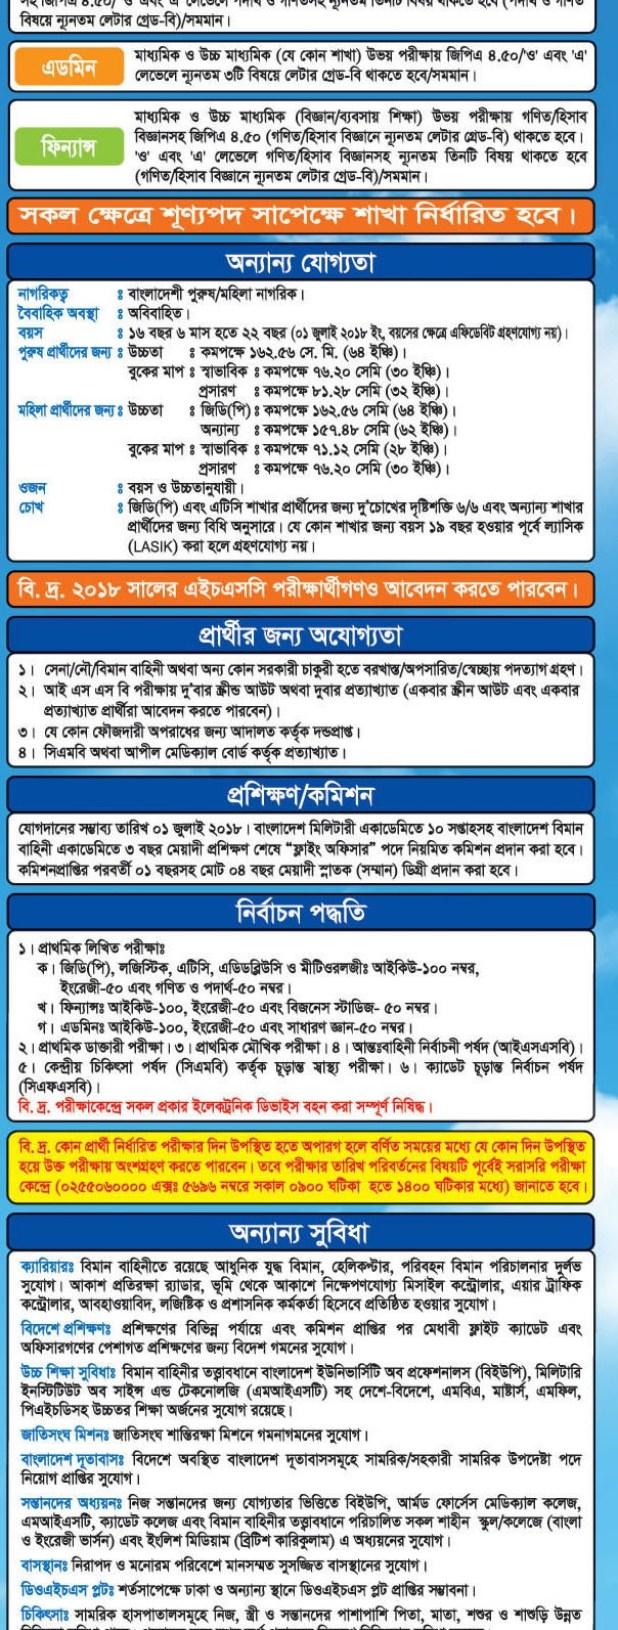 Air Force job circular 2018 Govt Jobs in Bangladesh2